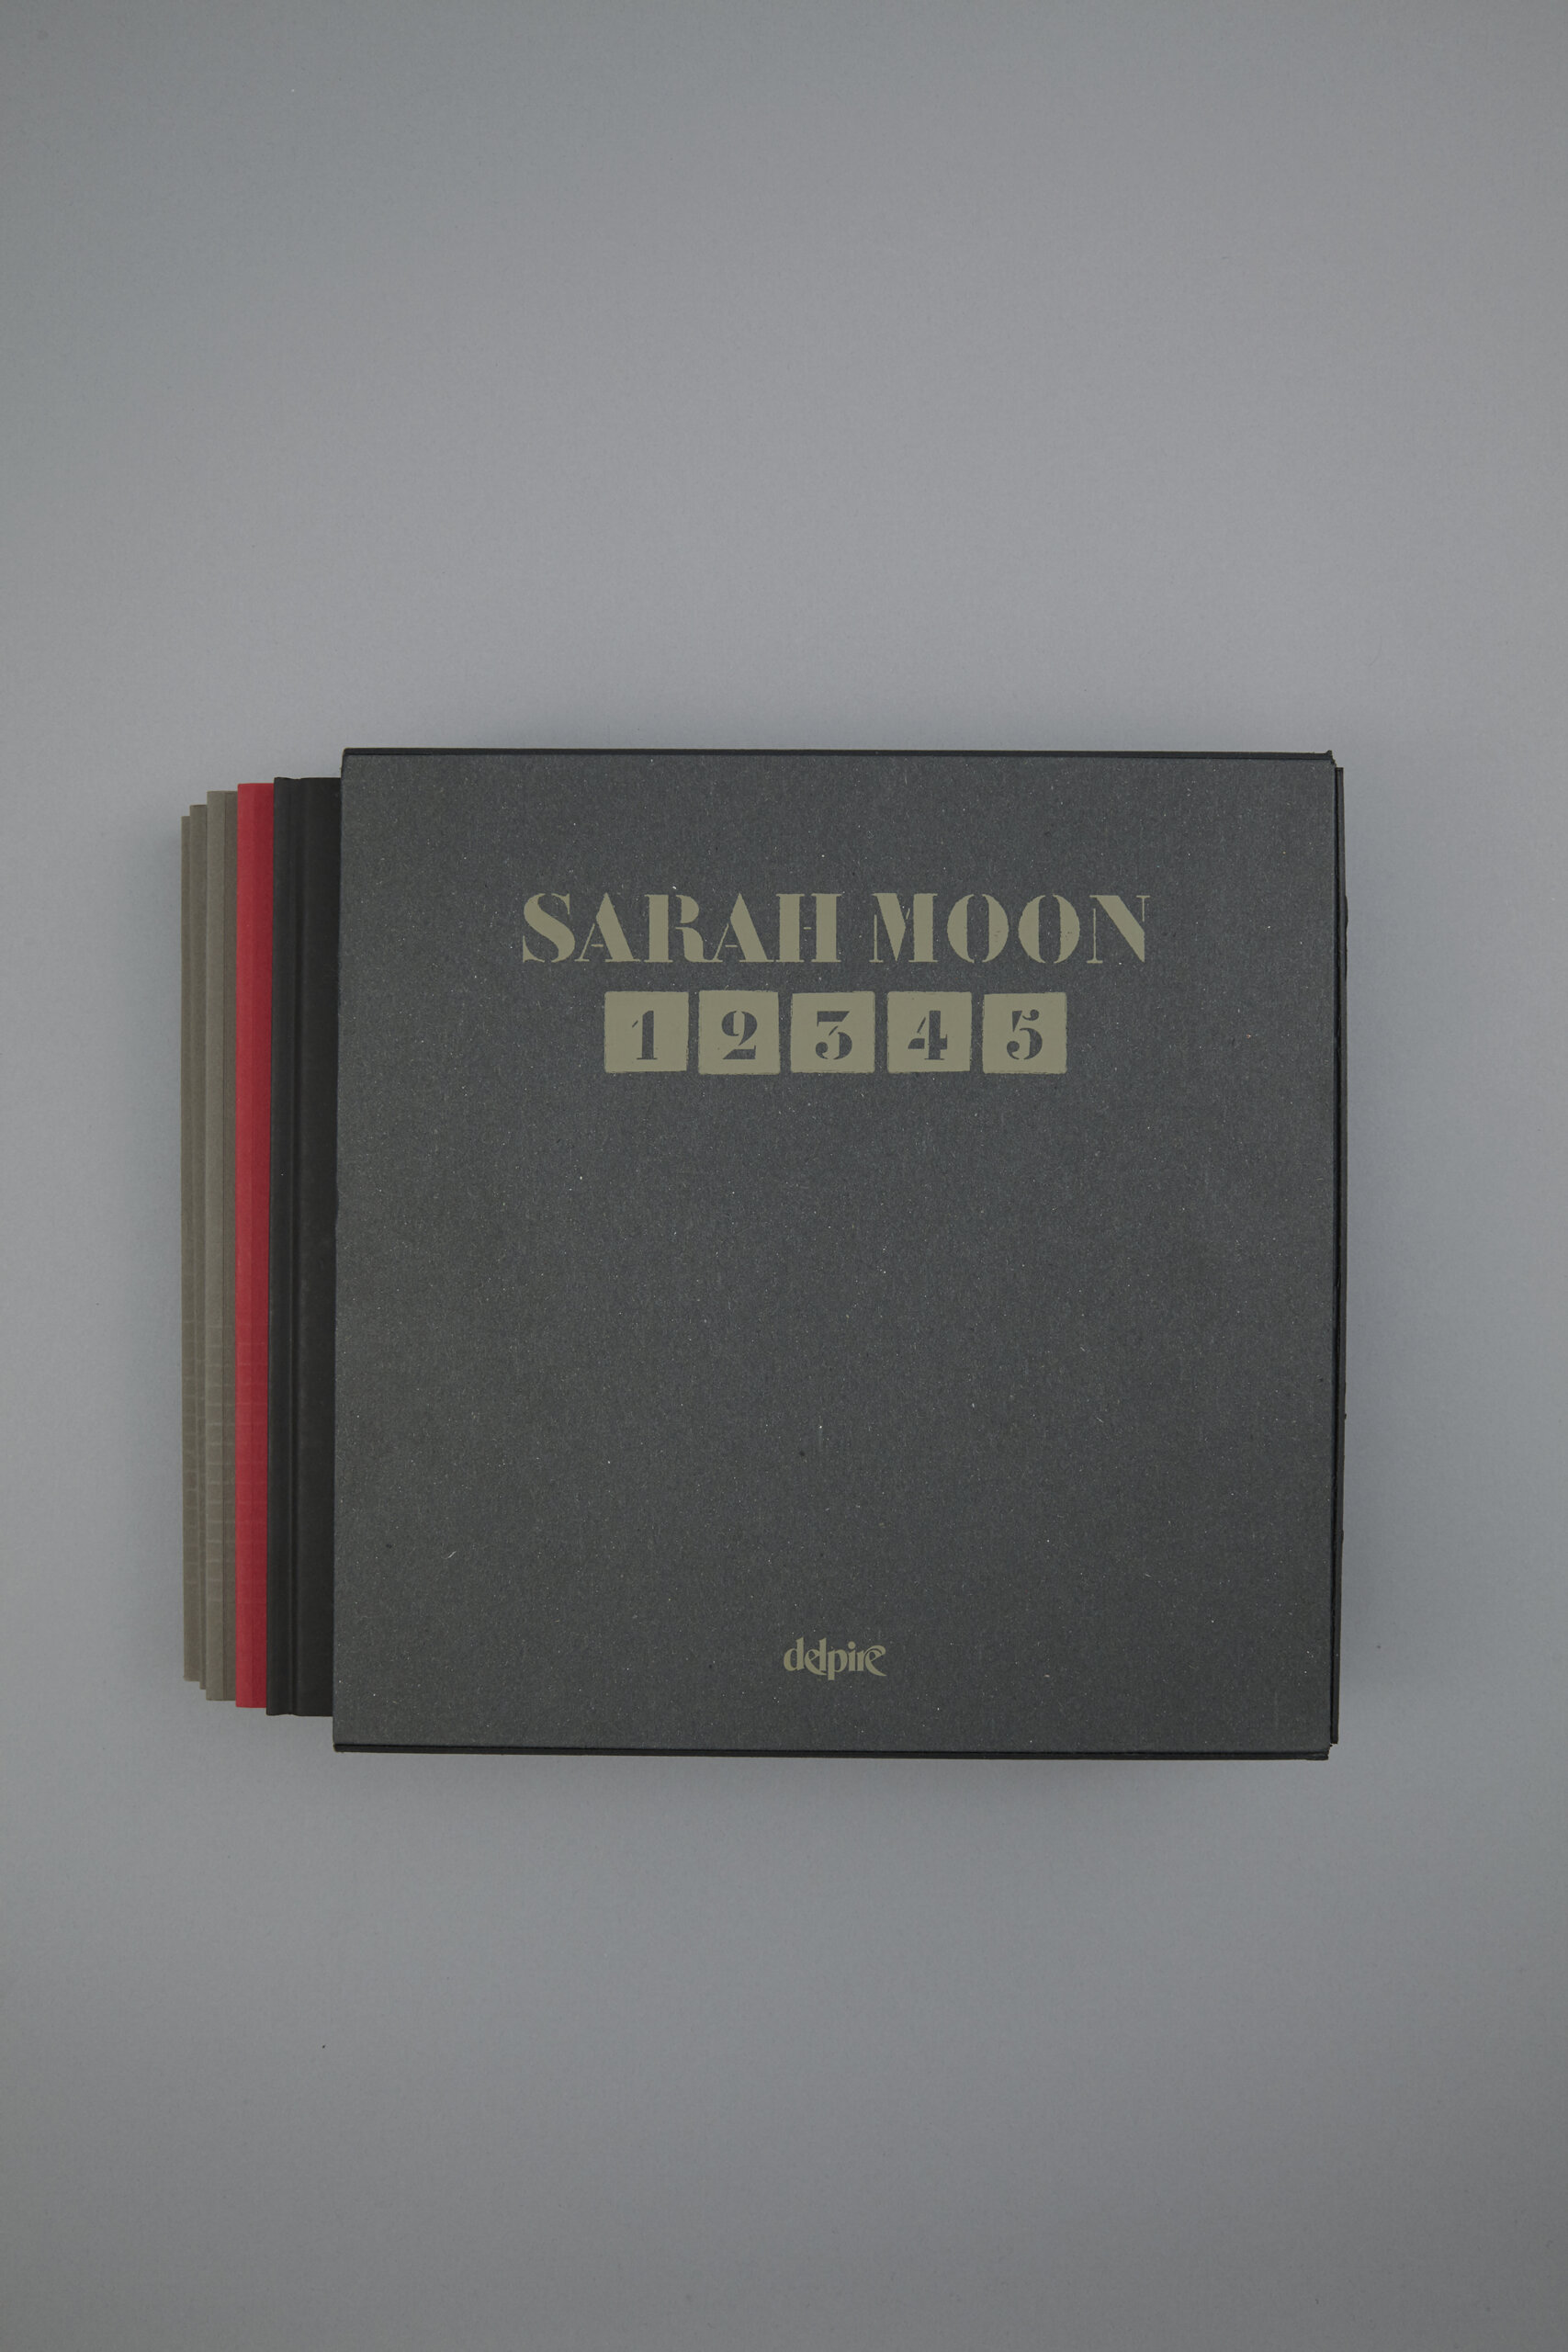 sarah-moon-12345-delpire-3